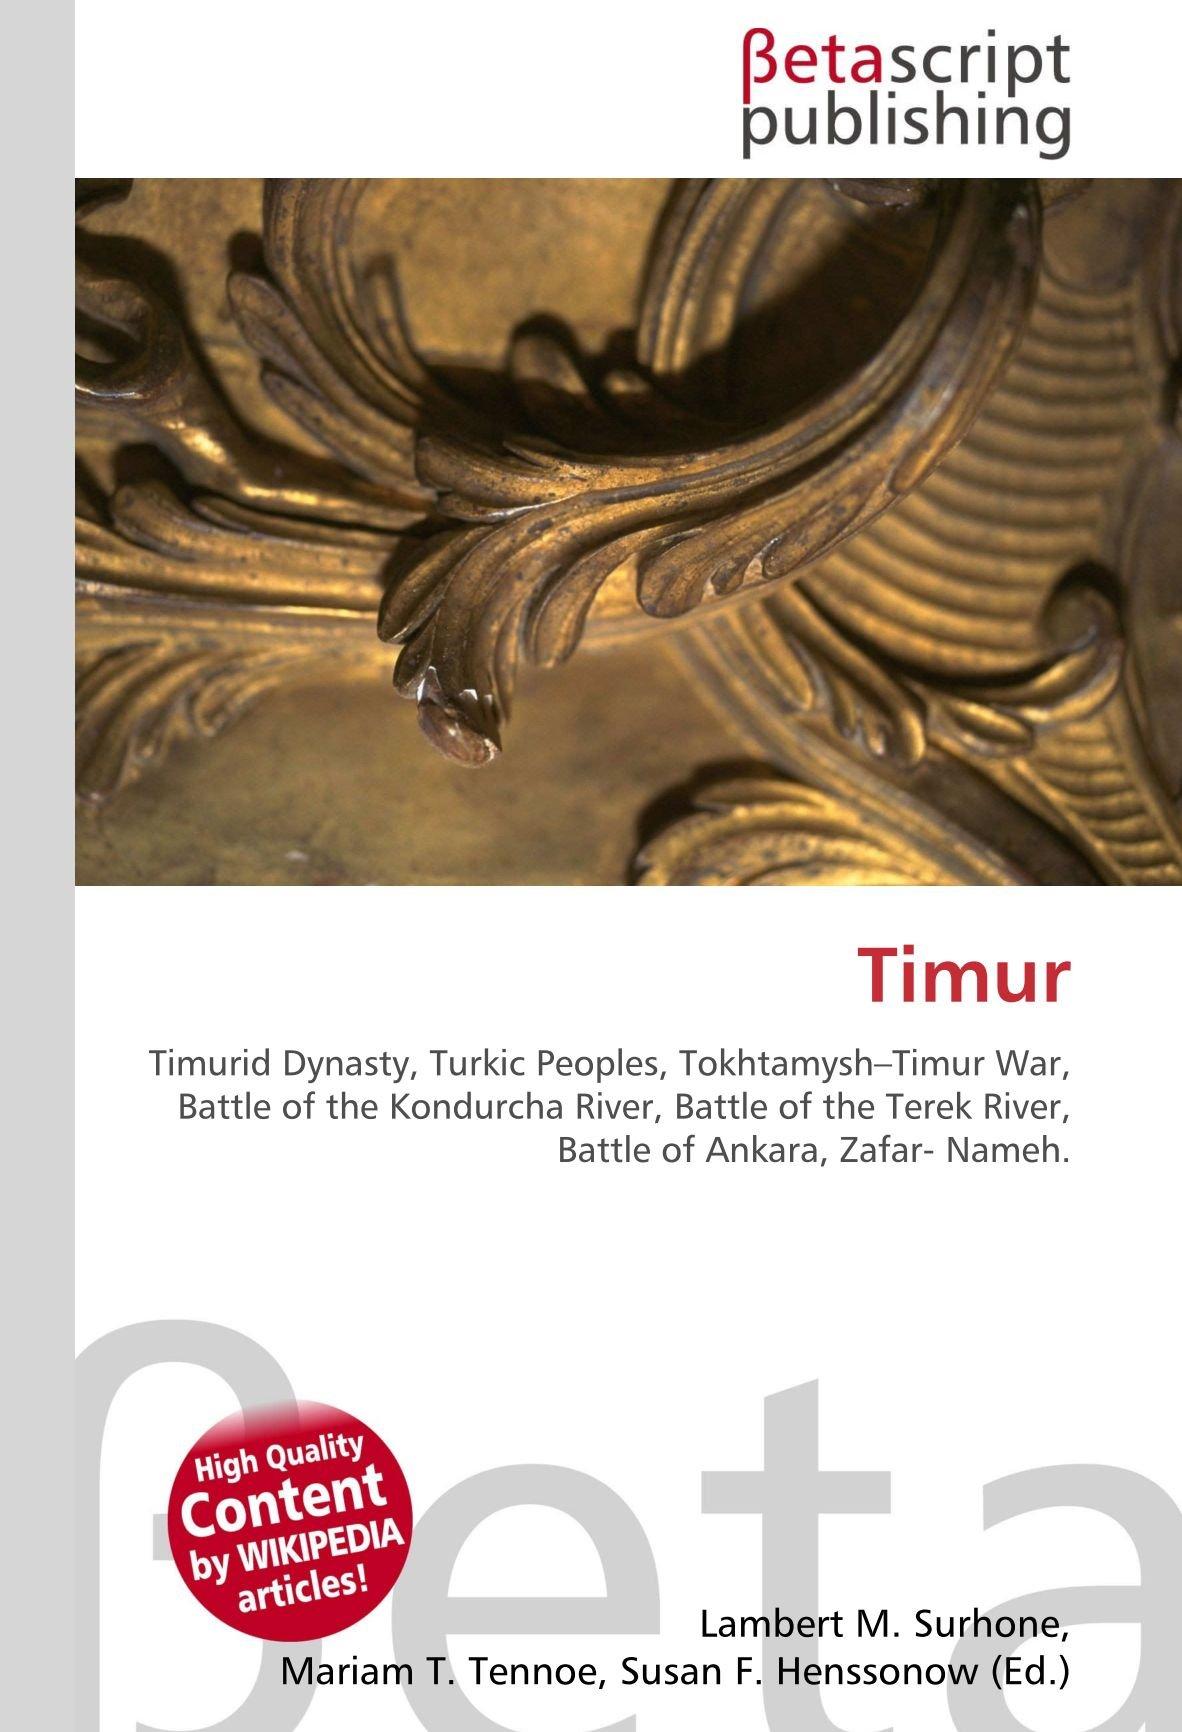 Timurian tinder dating site